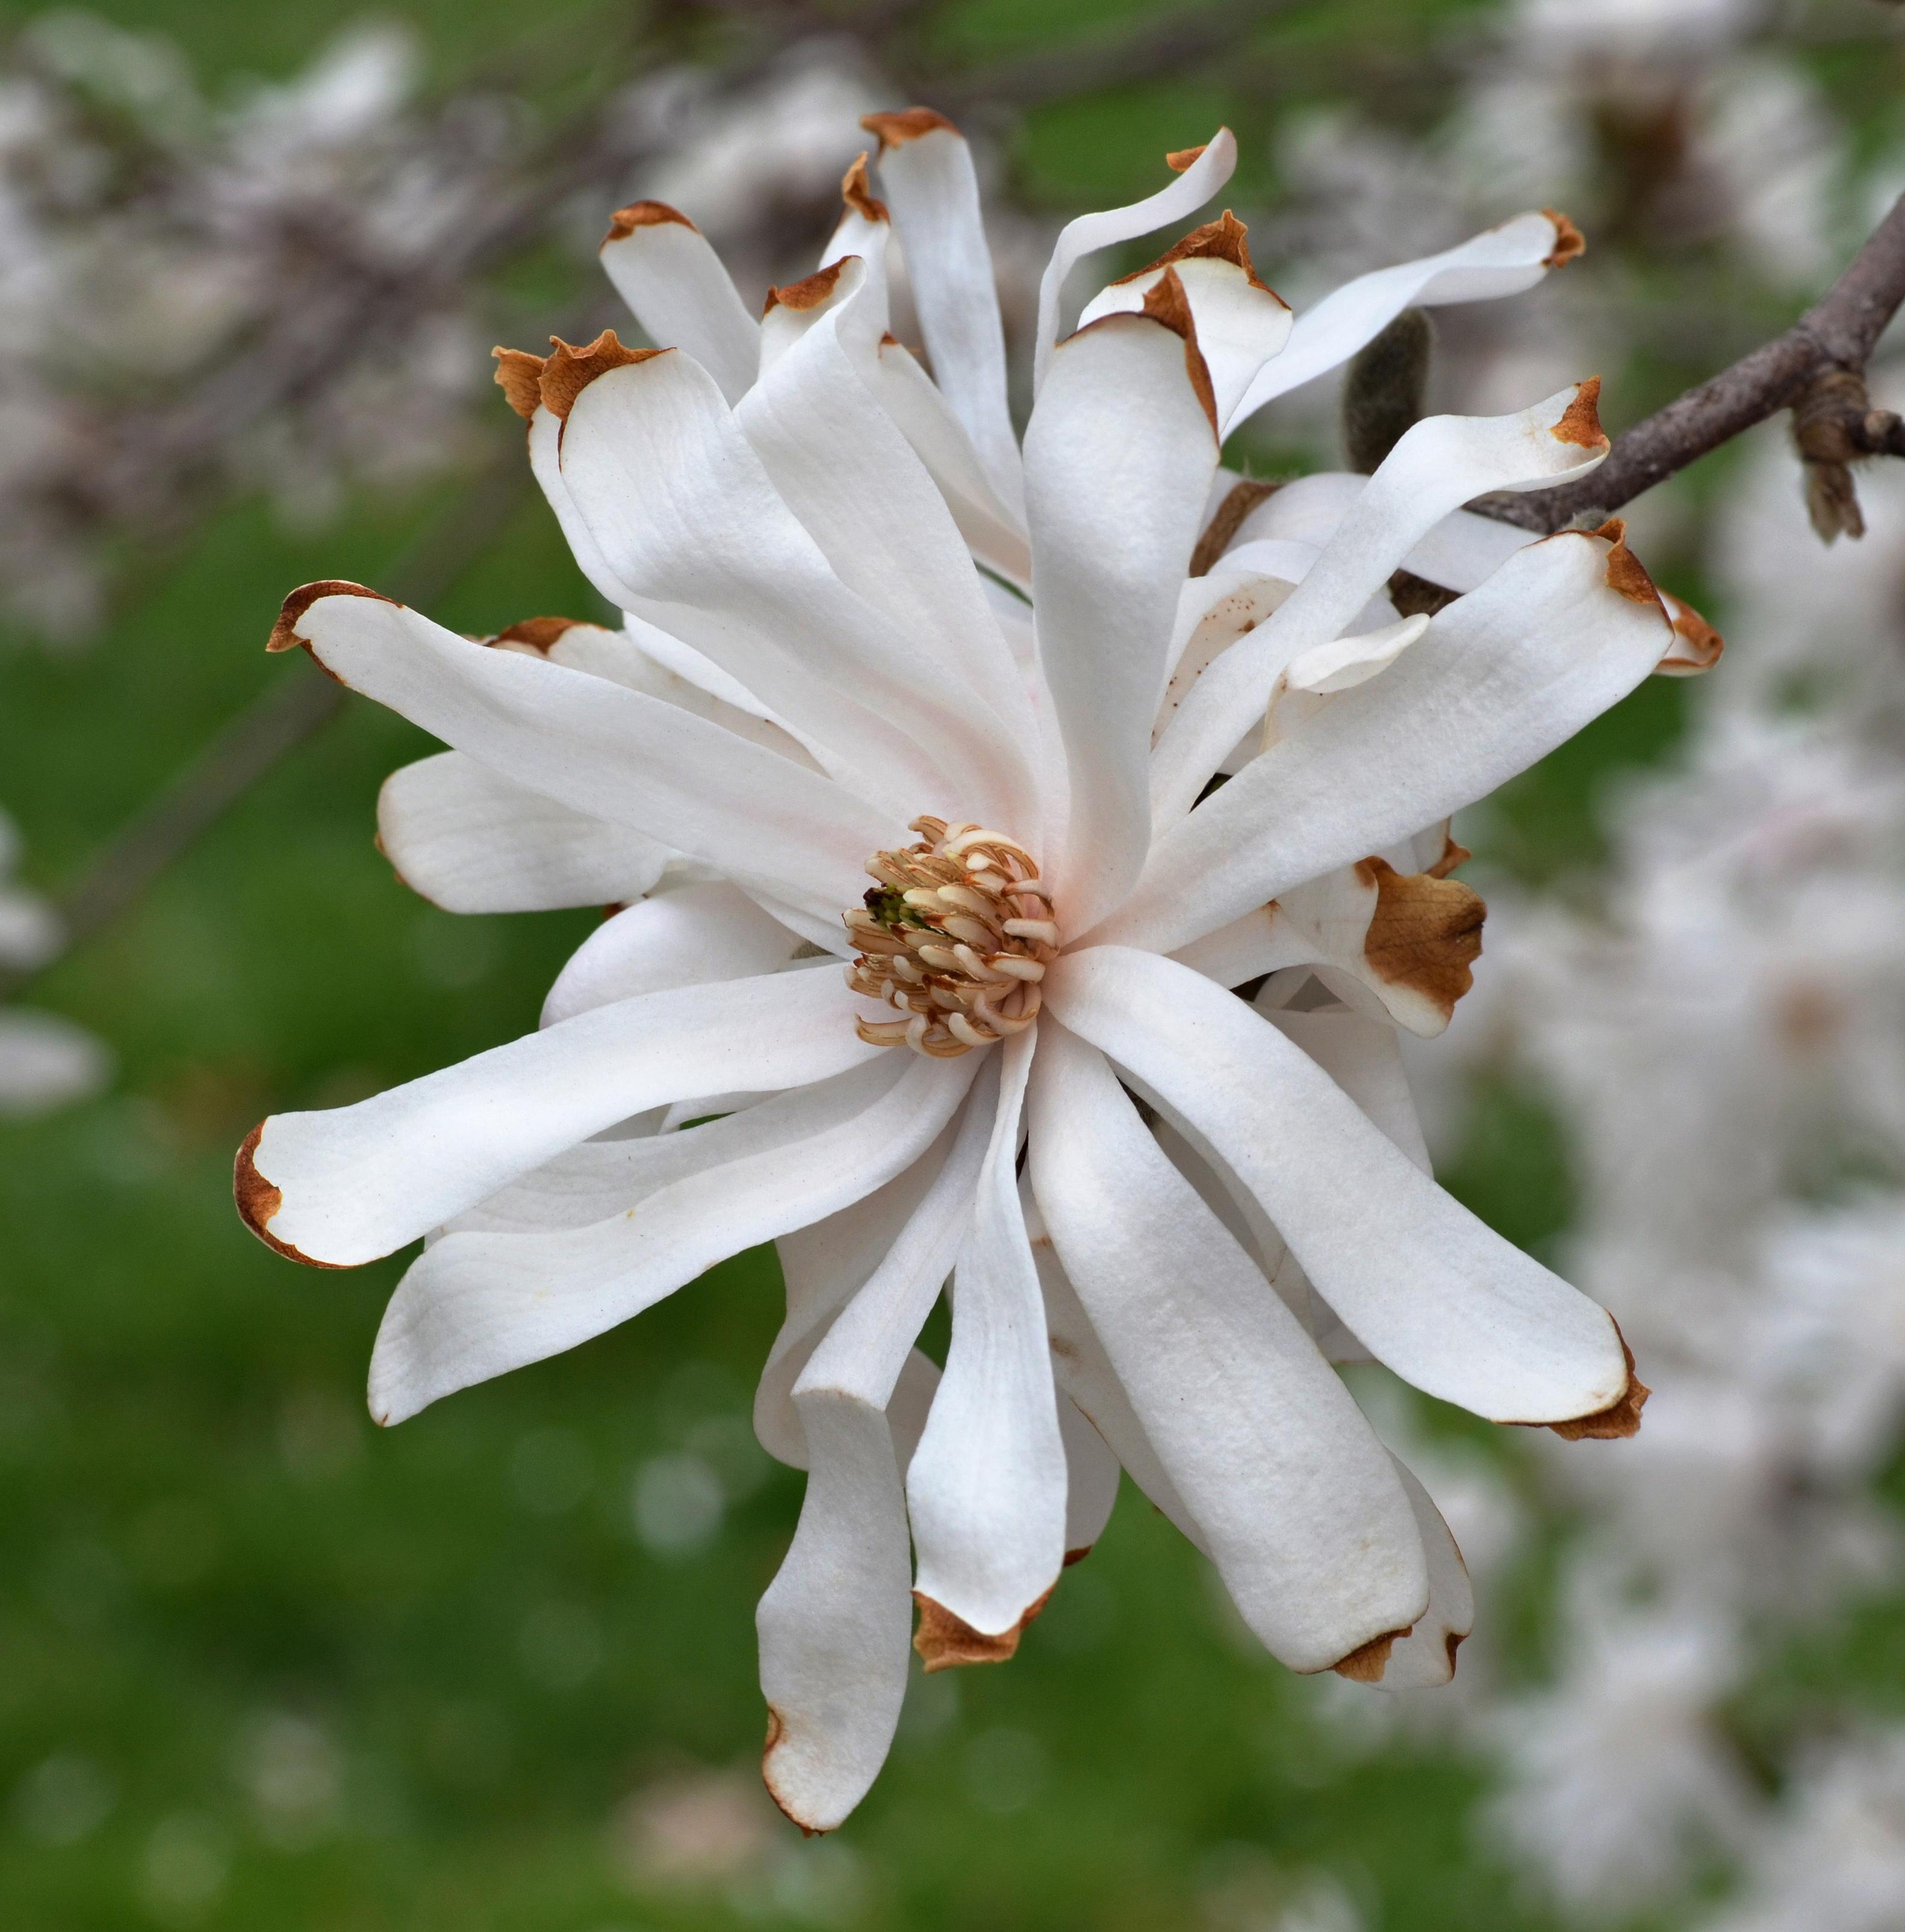 Filestar Magnolia Magnolia Stellata Royal Star Flower High Dof